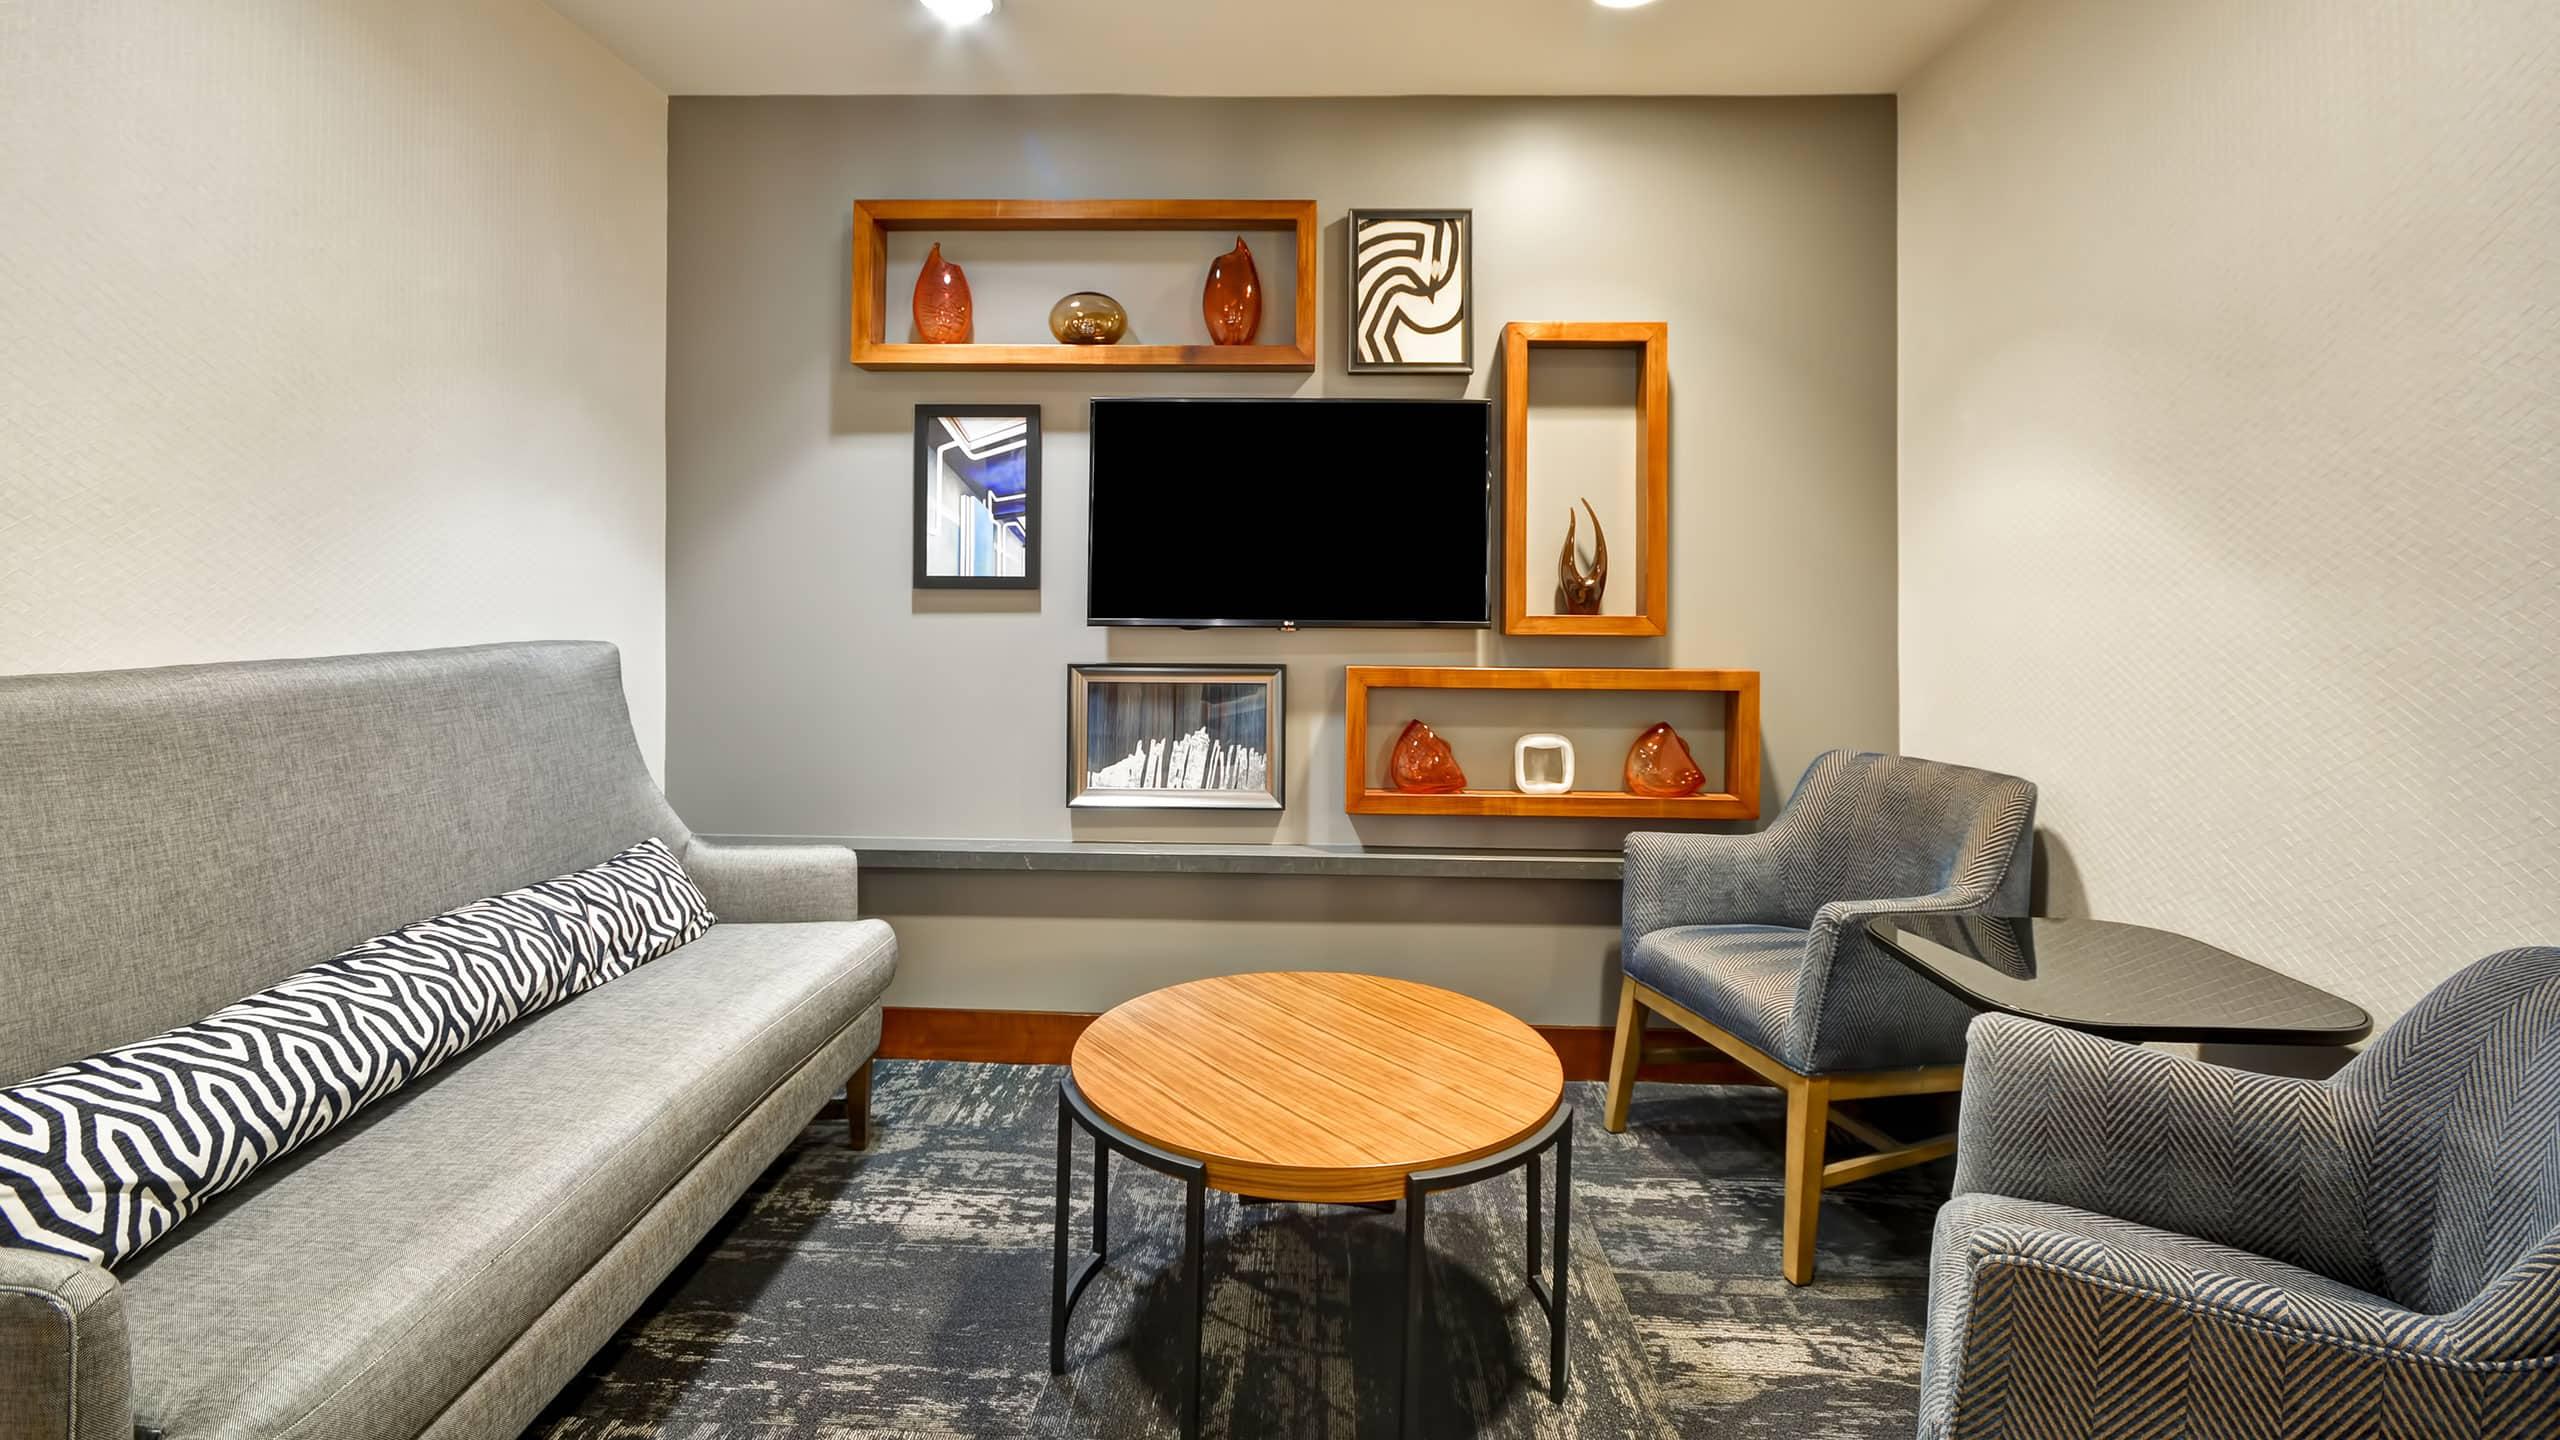 Merveilleux Comfortable Hotel In Overland Park Kansas City | Hyatt Place Kansas City / Overland  Park / Metcalf